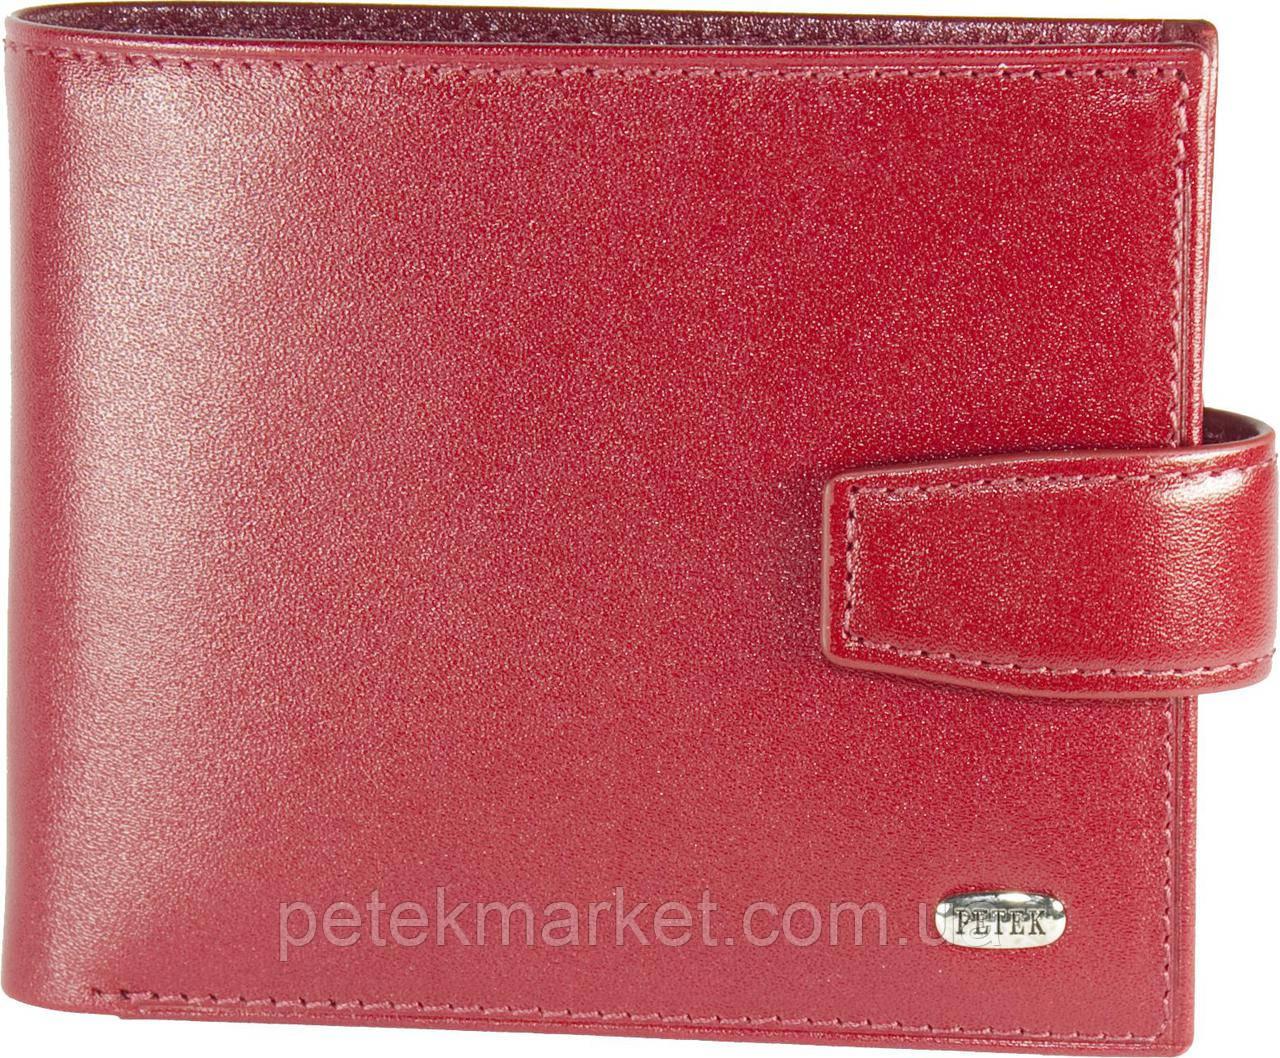 Кредитница Petek 1017, Красный, Гладкая, Матовая